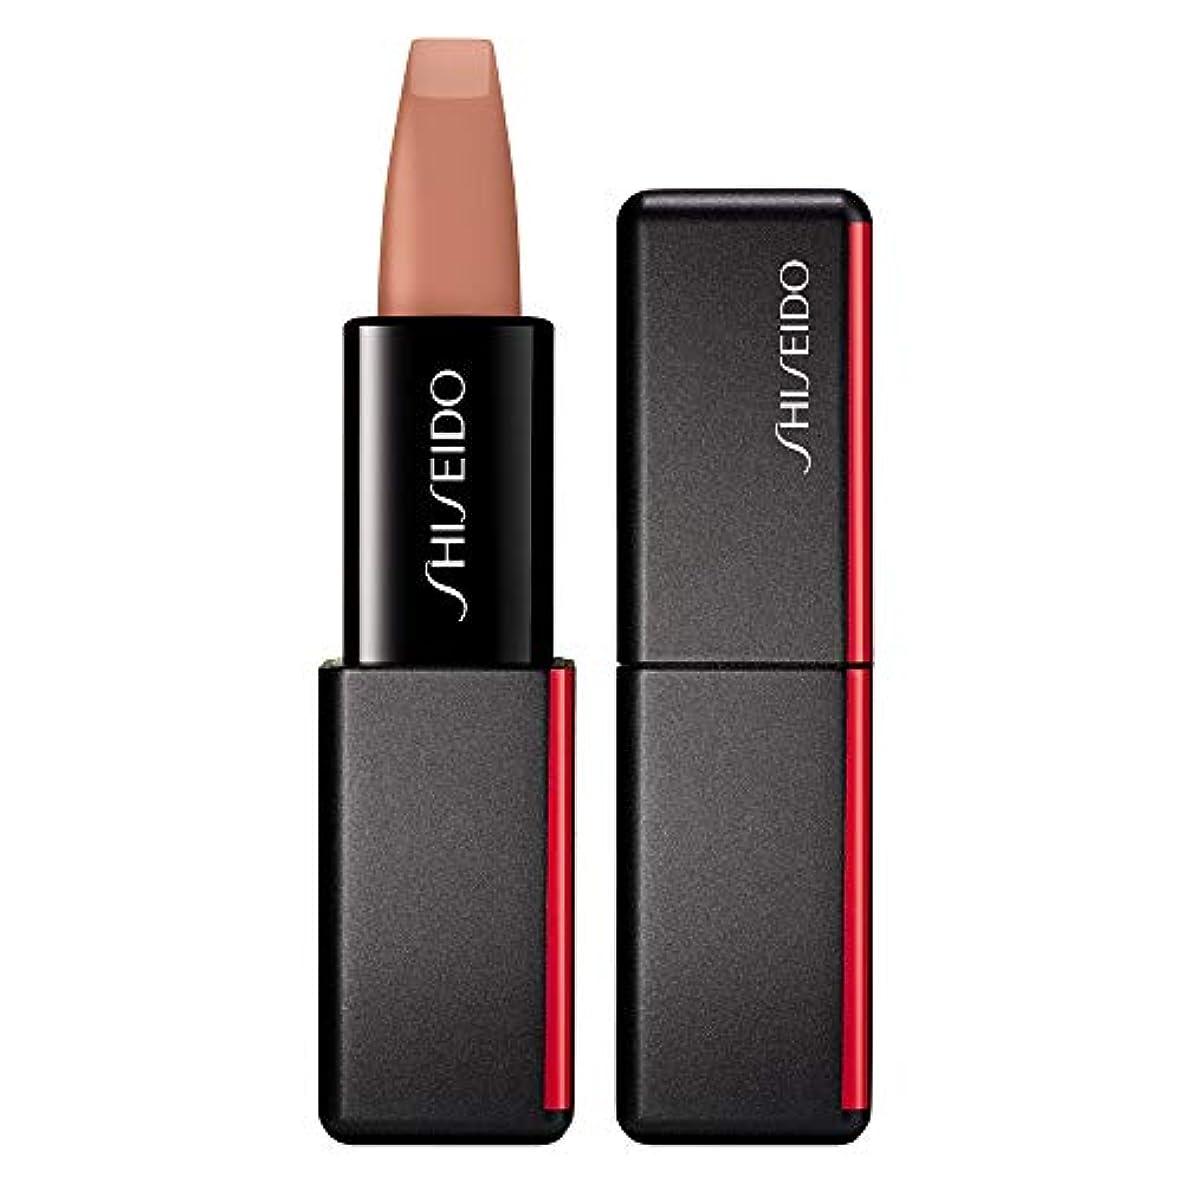 台風幻影安価な資生堂 ModernMatte Powder Lipstick - # 502 Whisper (Nude Pink) 4g/0.14oz並行輸入品